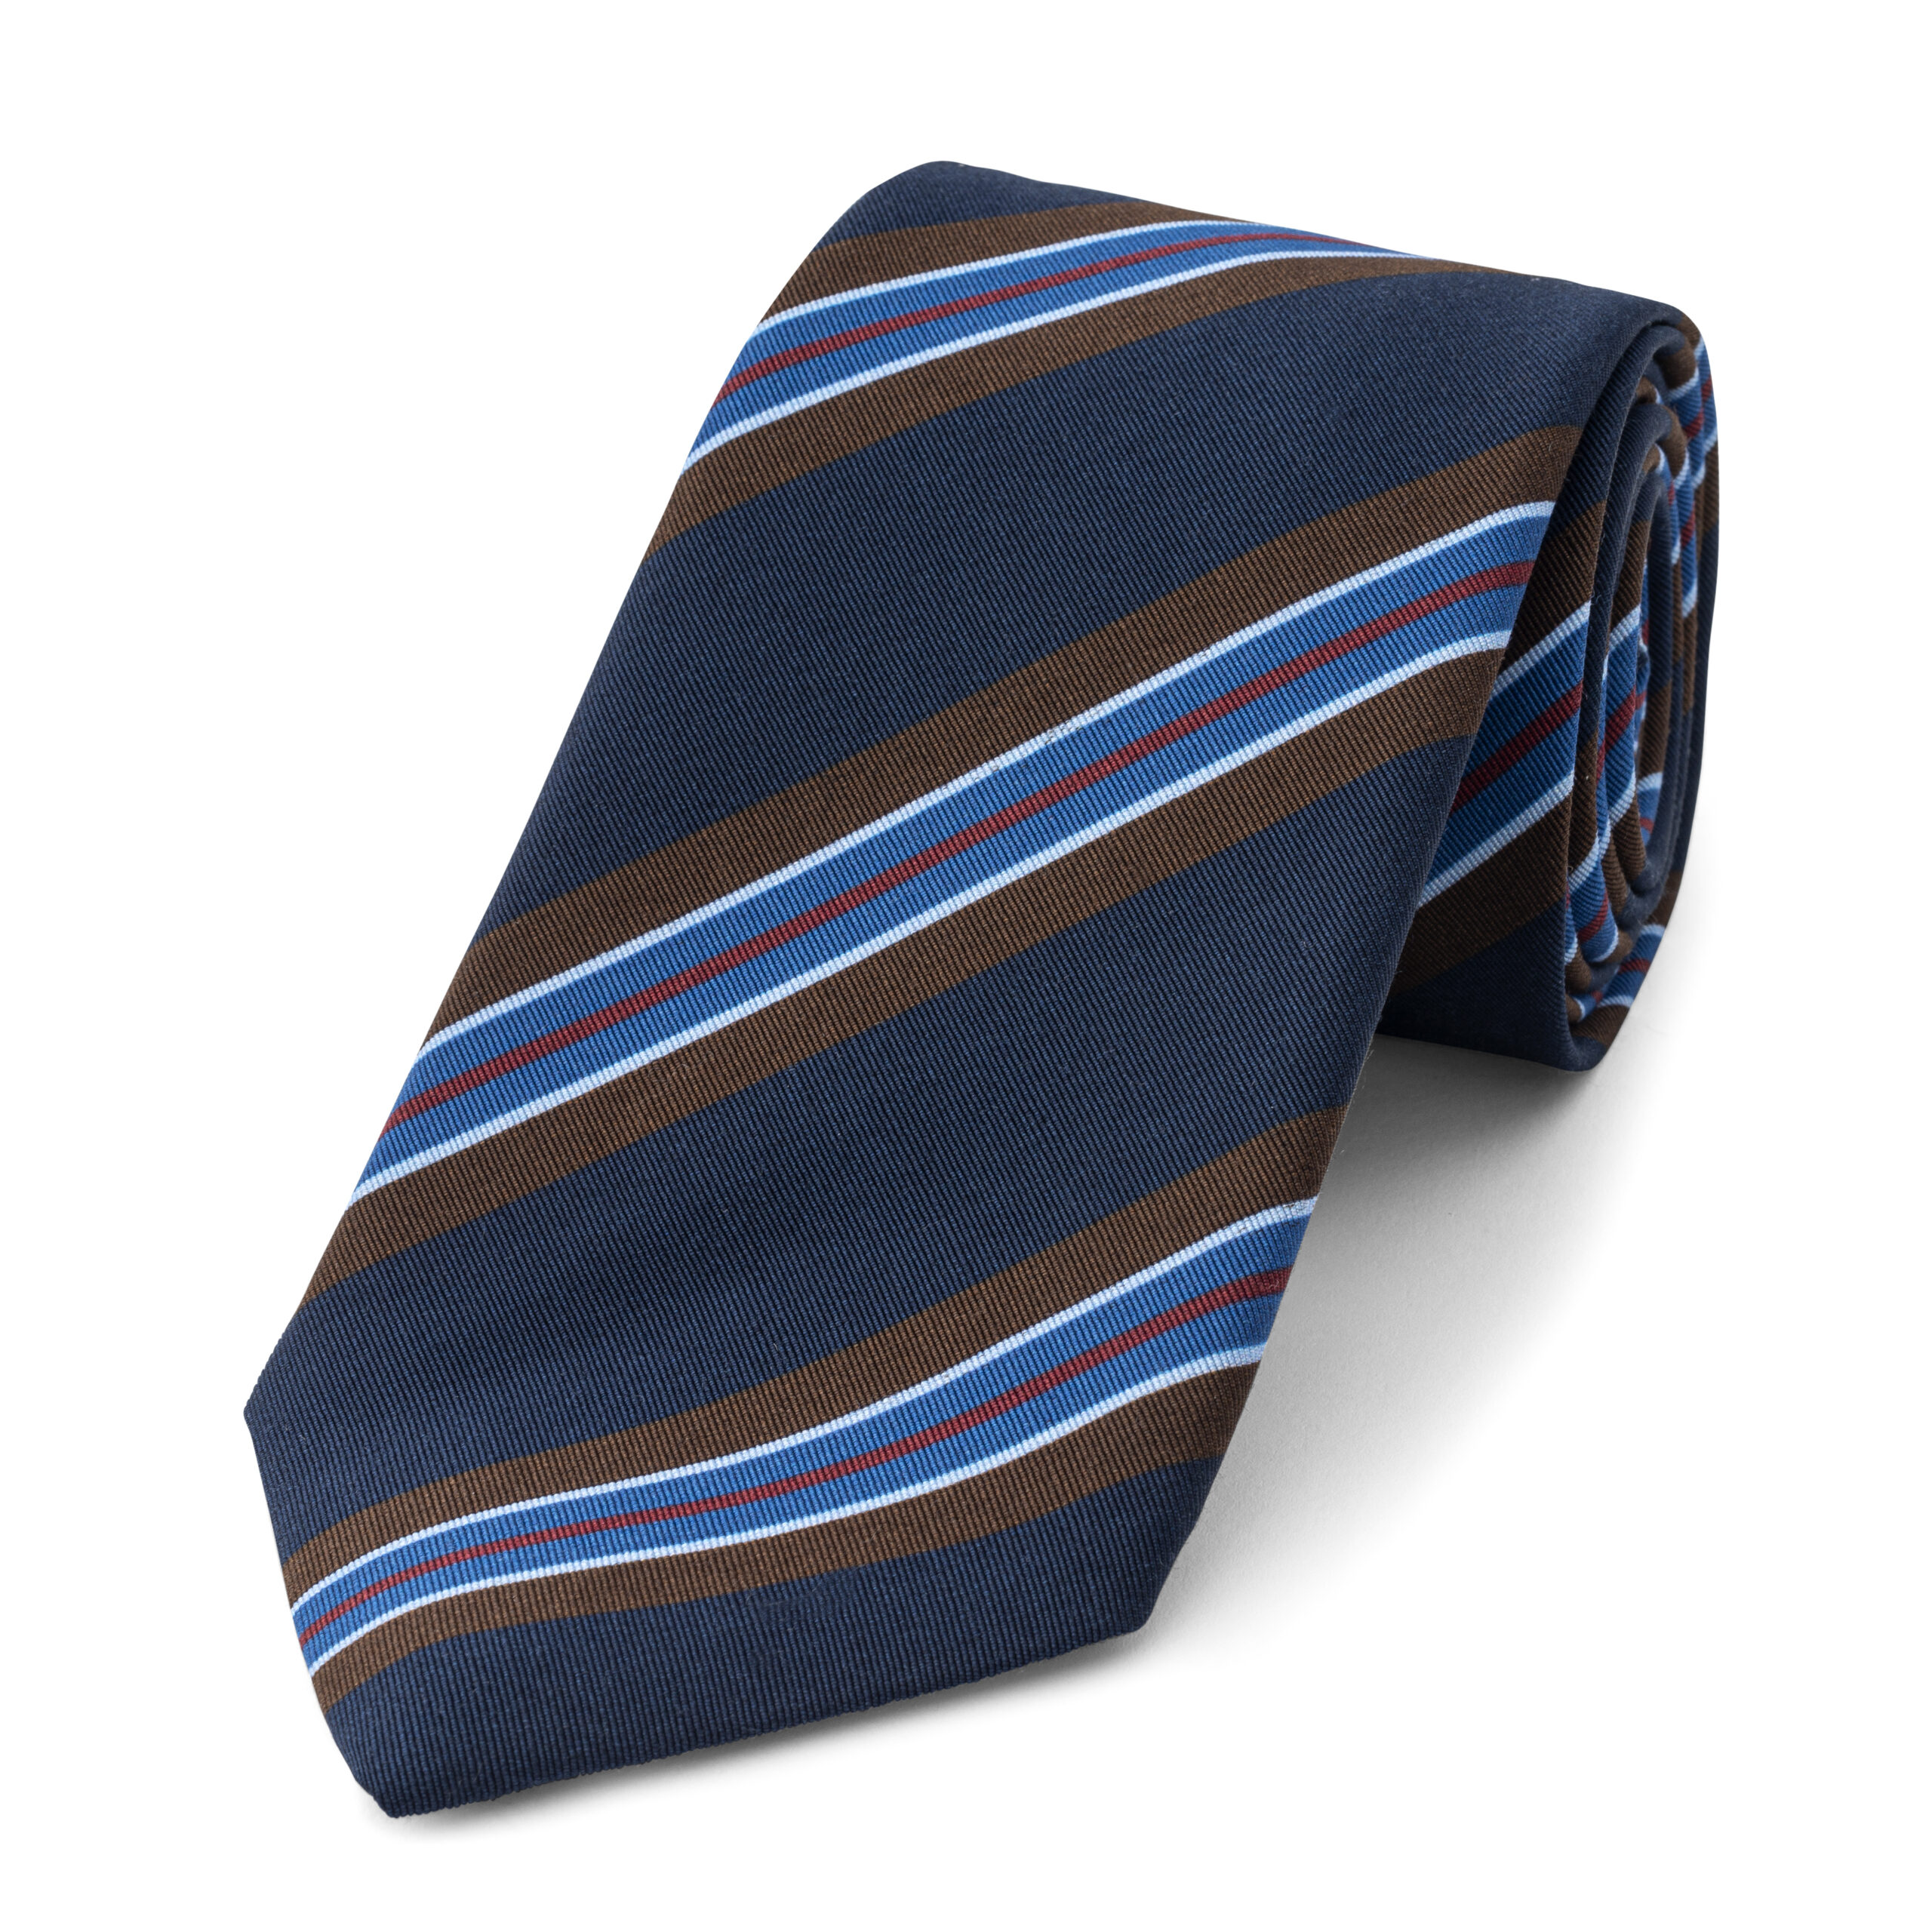 Stripe Irish Poplin Tie in Burgundy, Navy and White